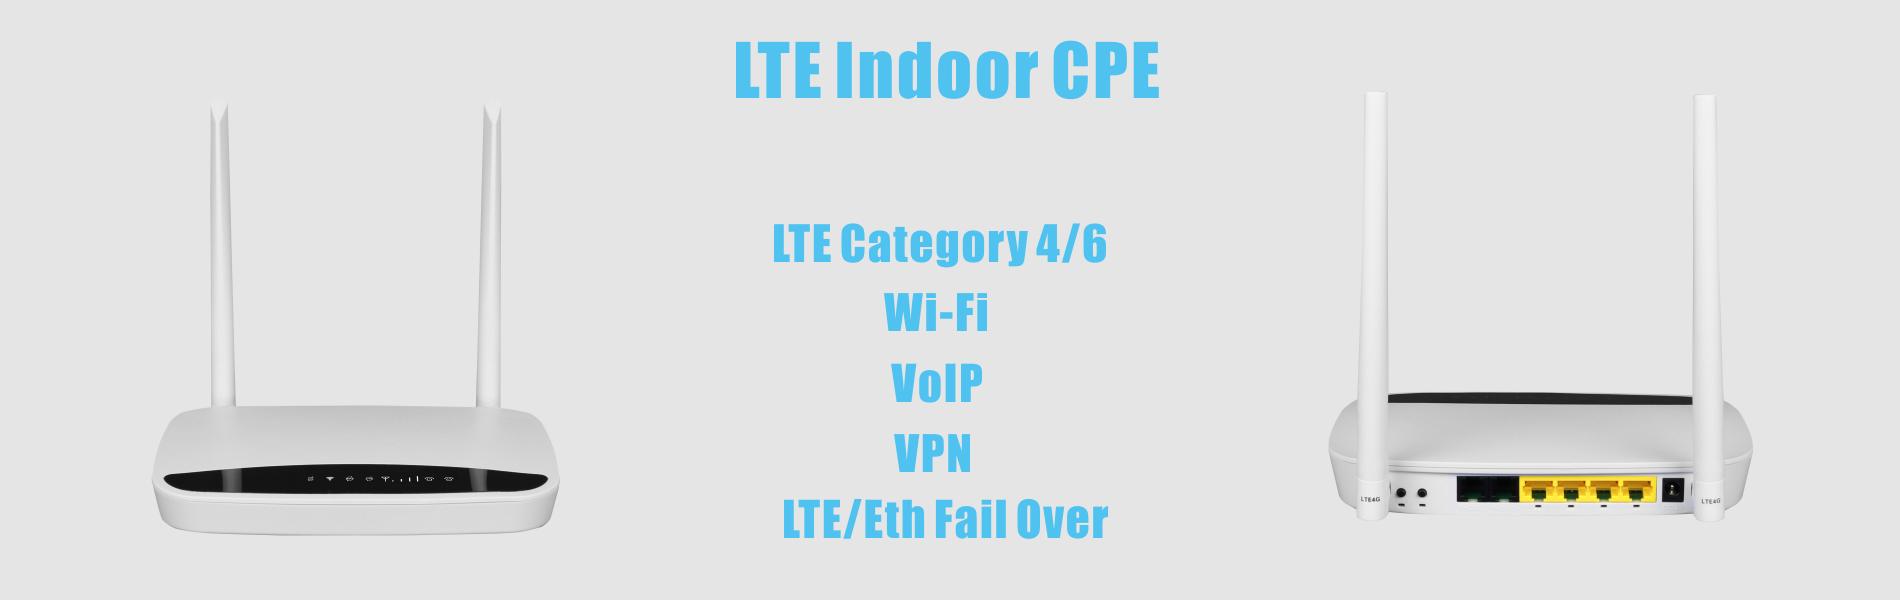 5G LTE Indoor CPE